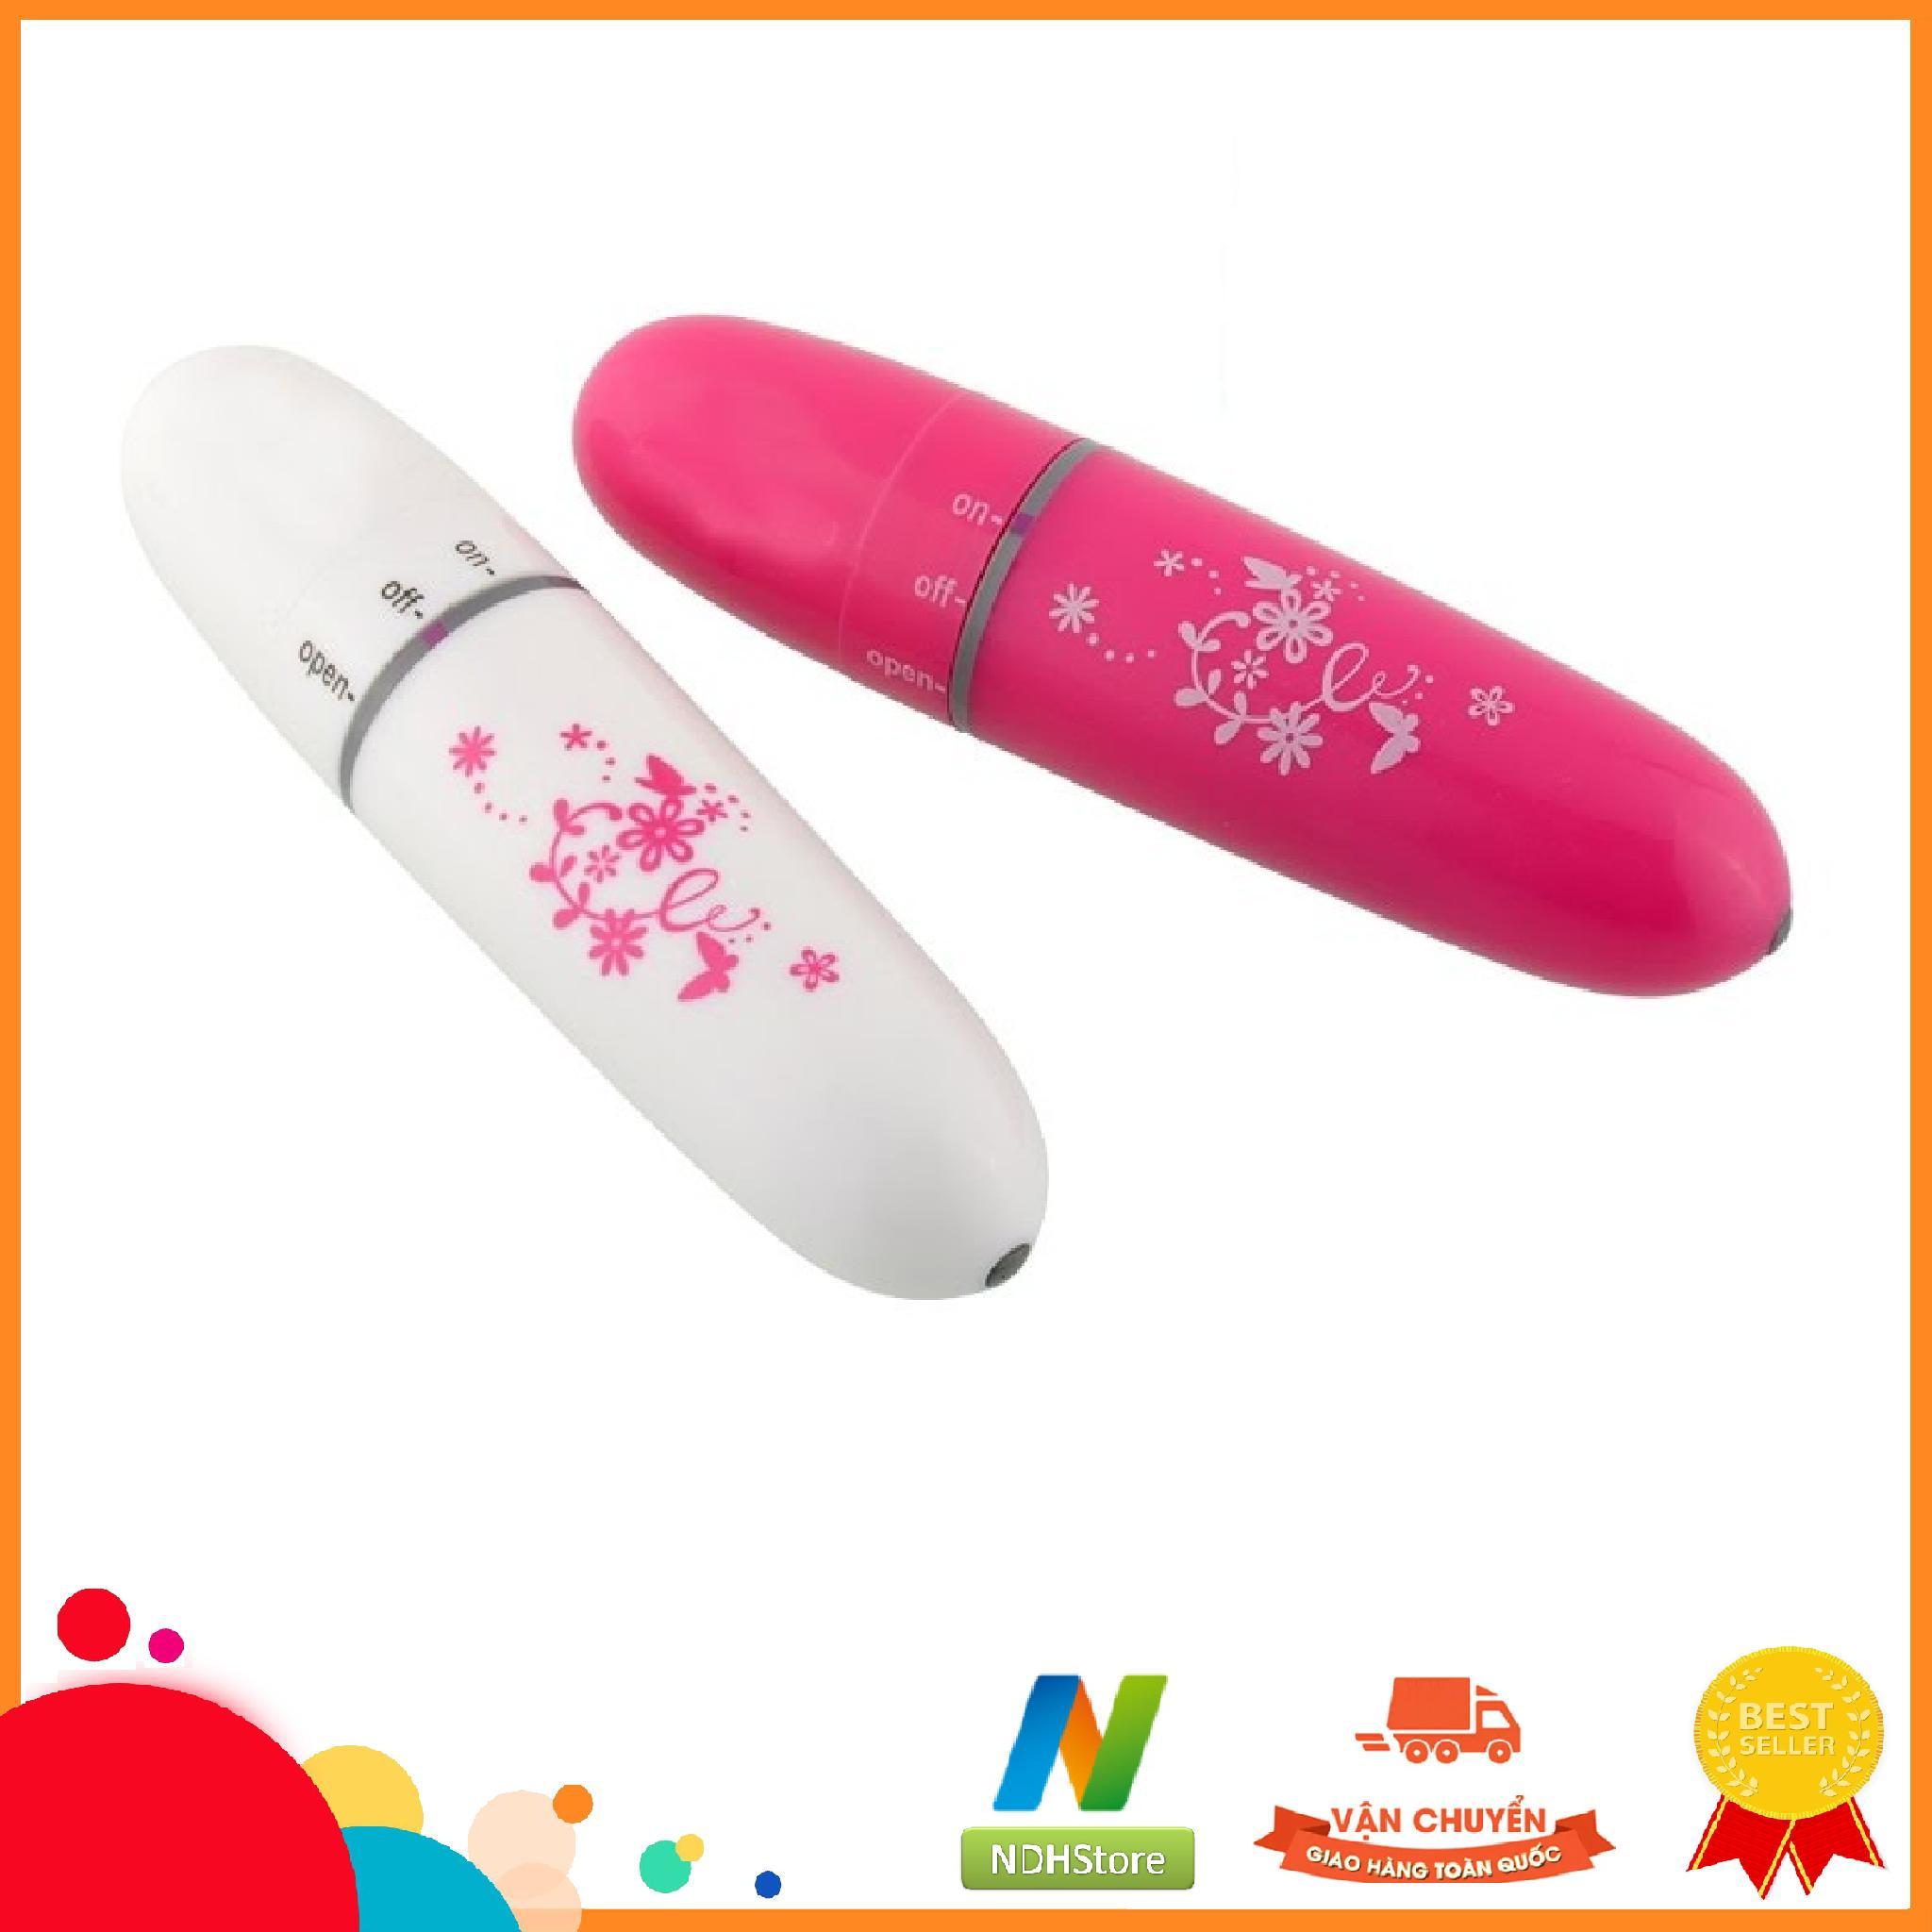 Hot Deal Khi Mua Bút Massage Mắt Mini Cầm Tay 208 - Electric Mini Vibrations Pouch Eye Massage Pen (Massge Mini Cầm Tay, Máy Mát Xa Mắt)